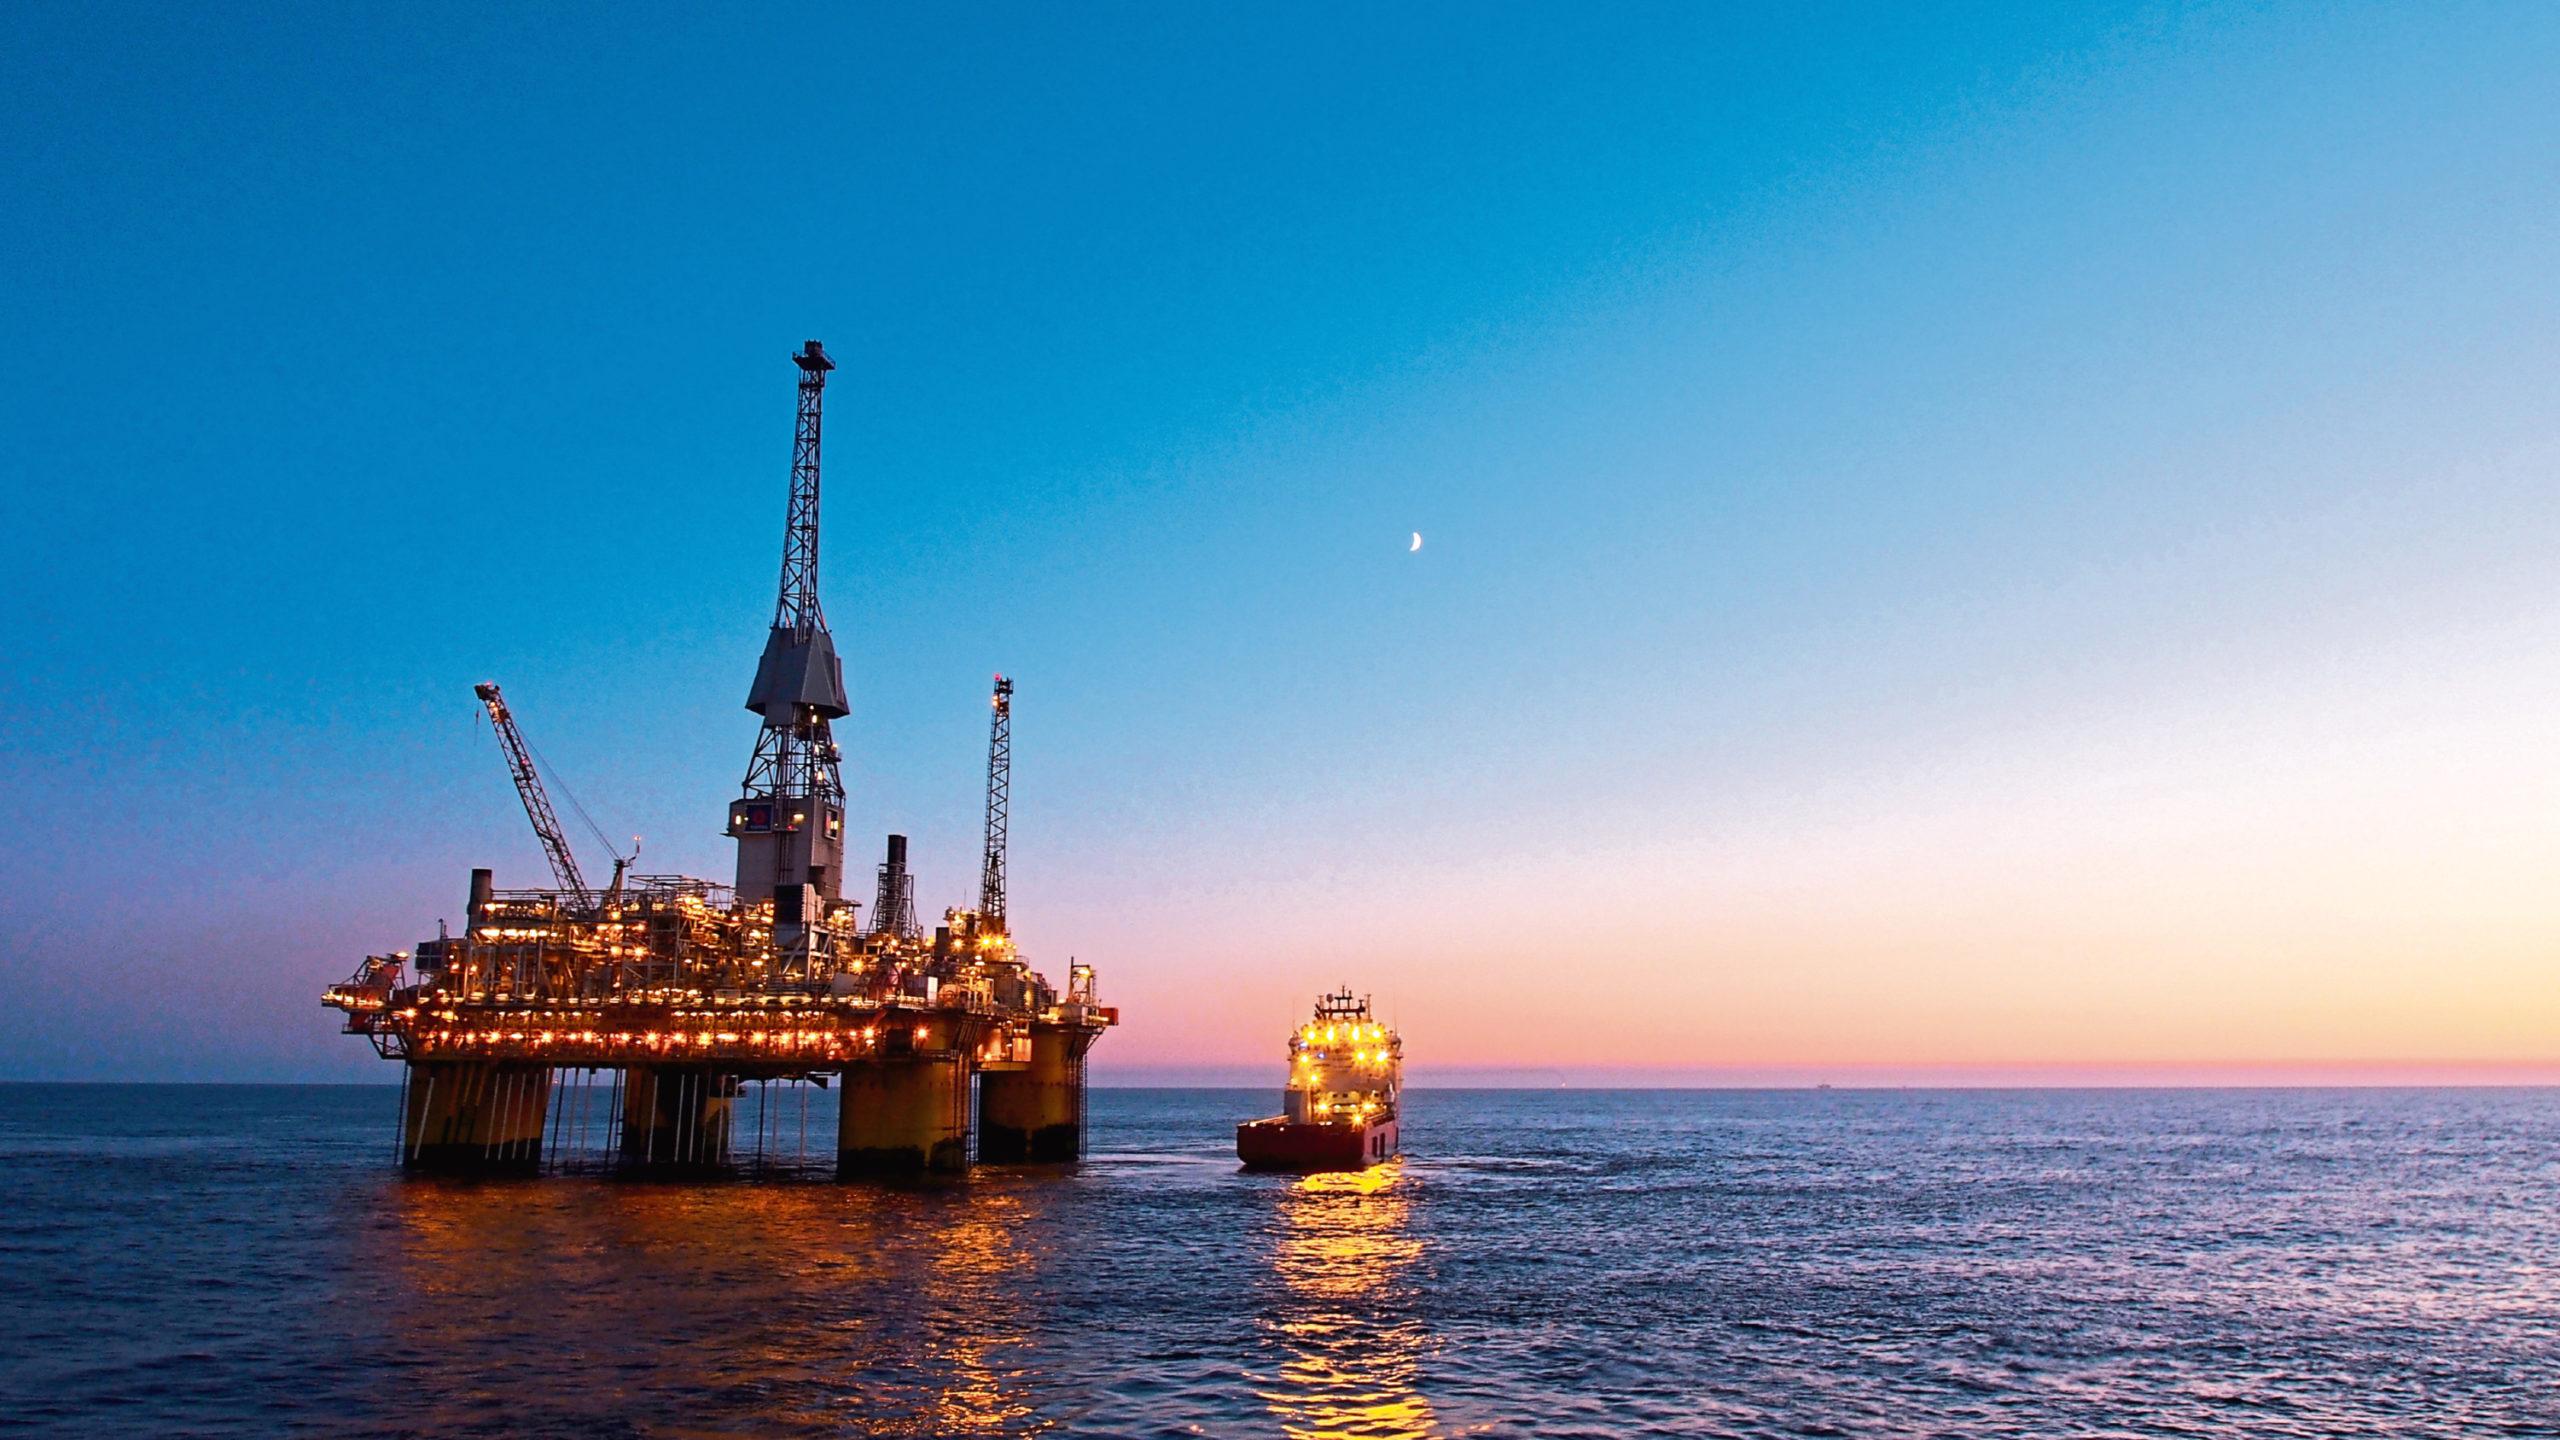 Production platform in North Sea region